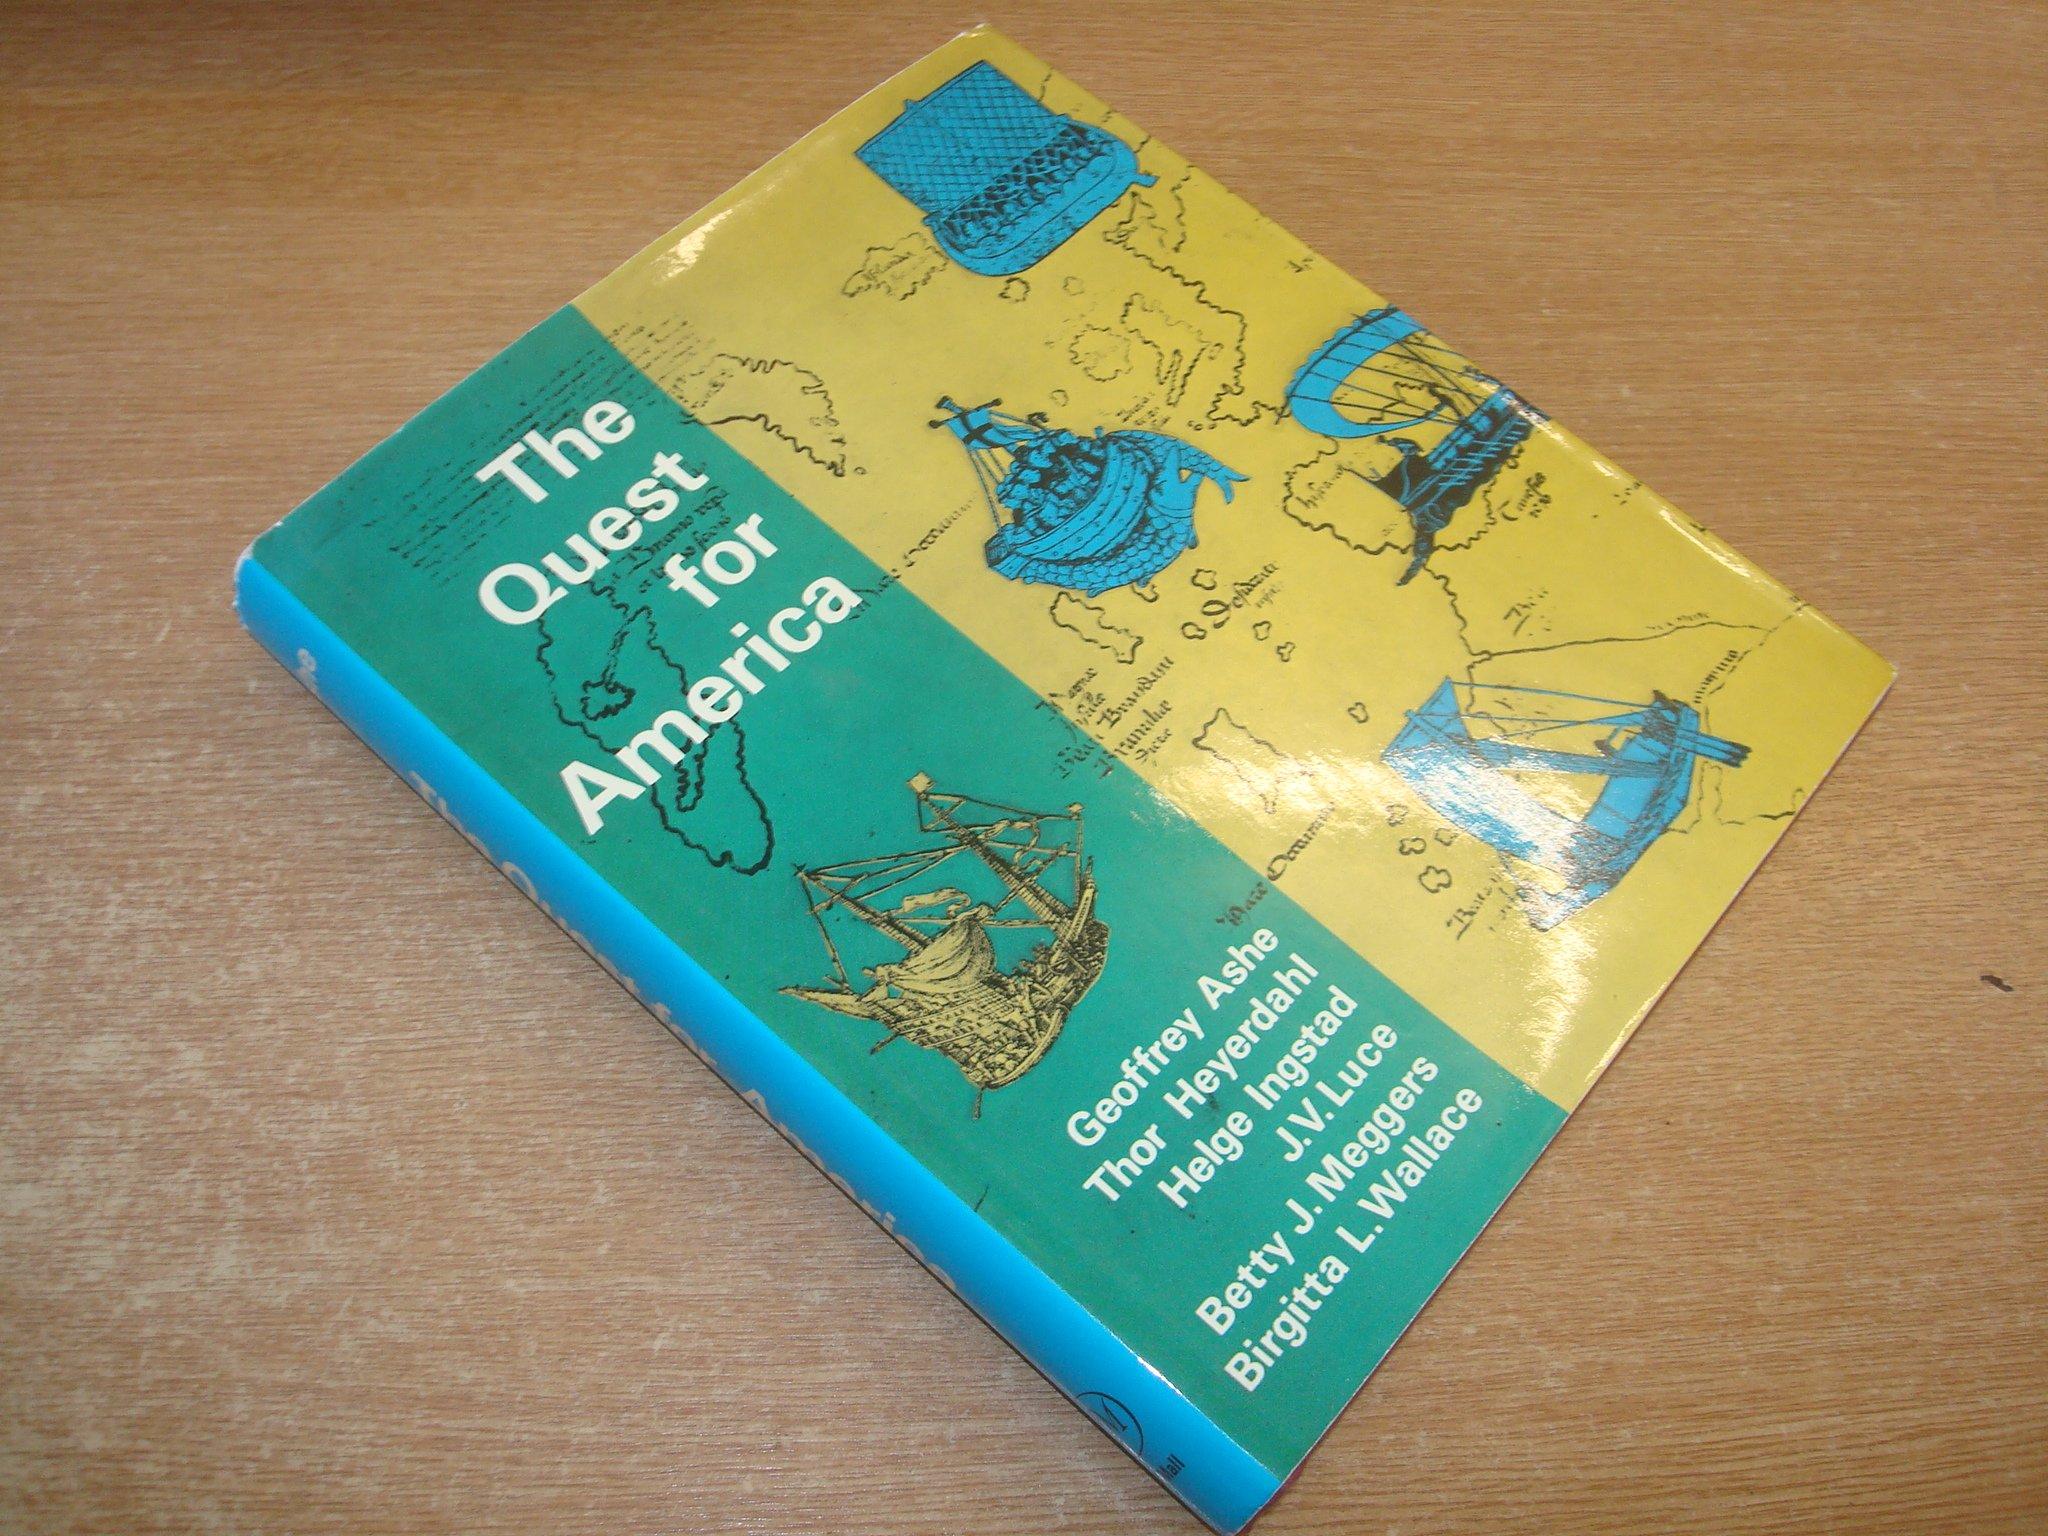 Quest for America: Amazon.co.uk: Geoffrey Ashe: 9780269027871: Books